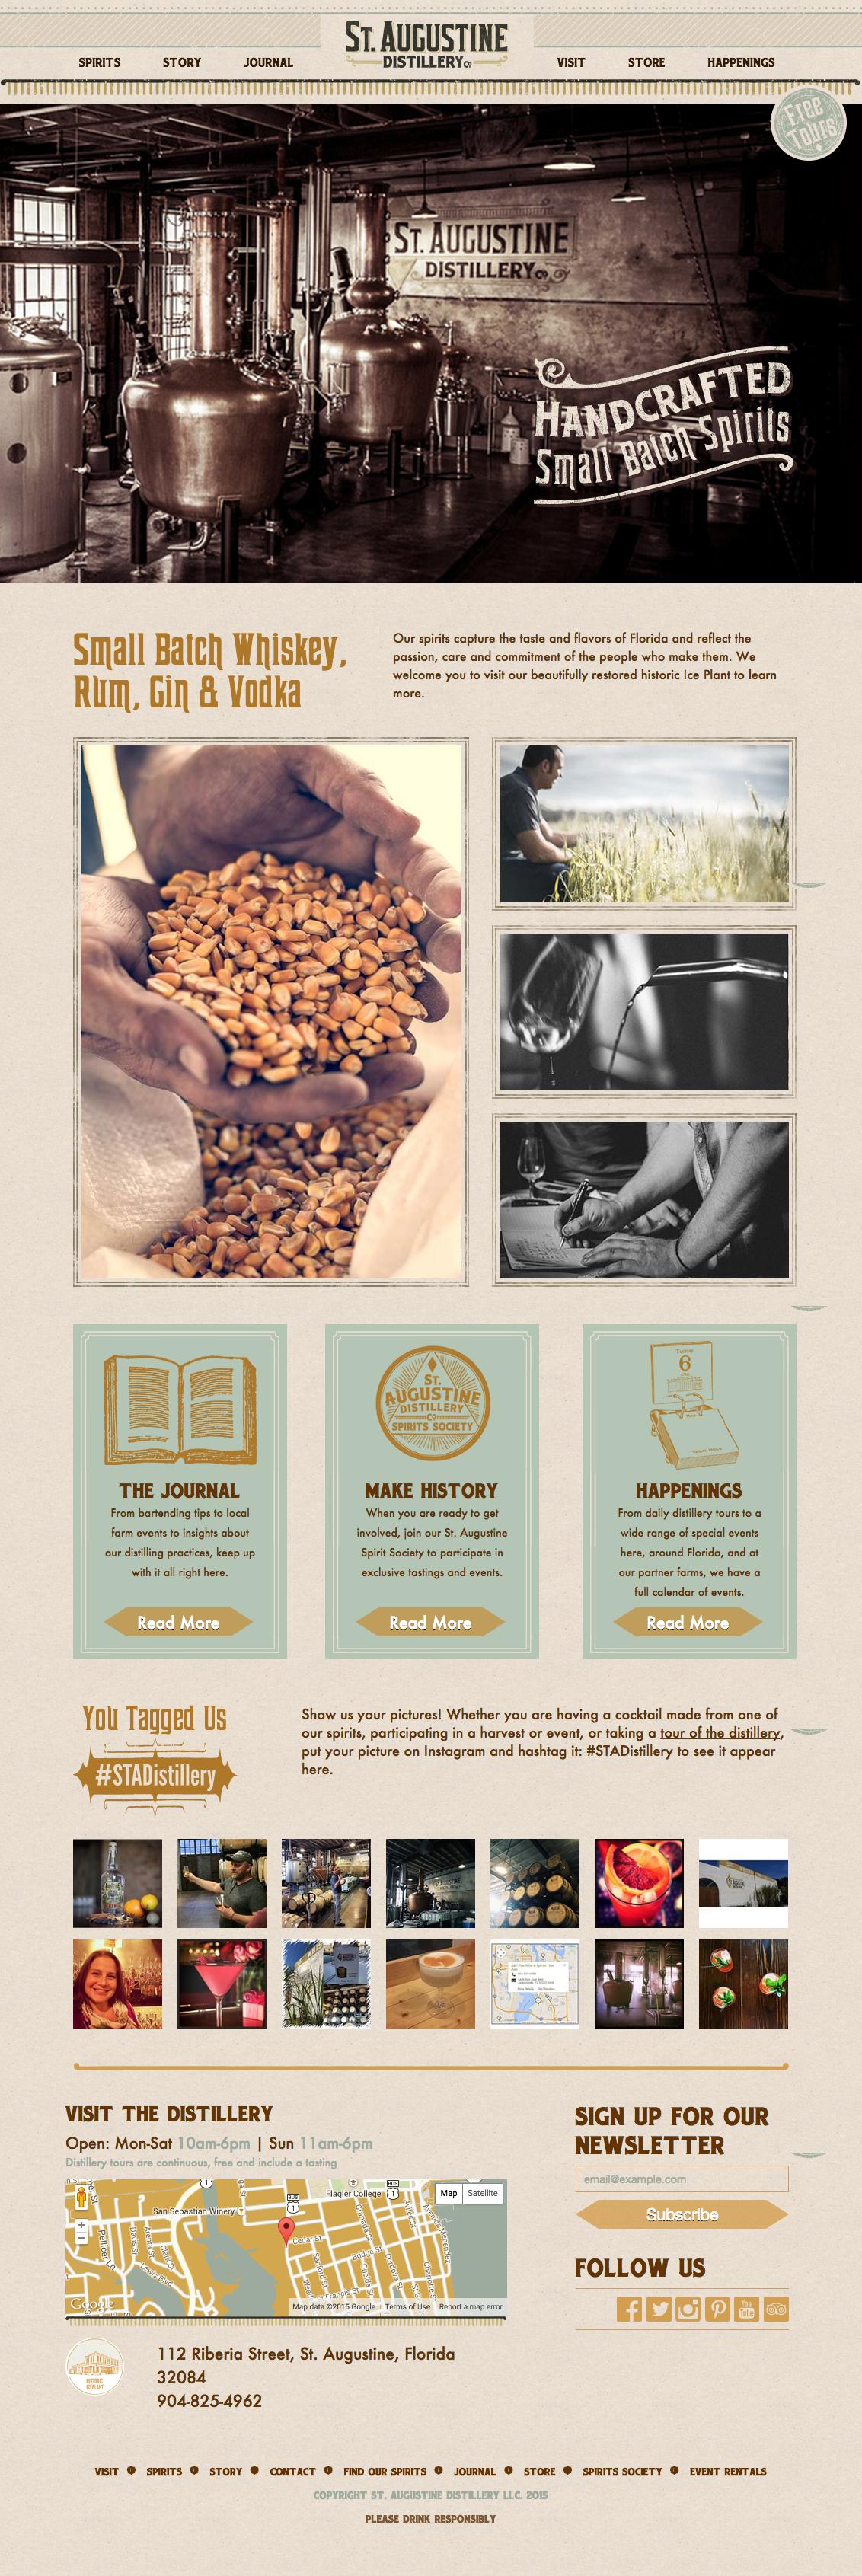 St Augustine Distillery's homepage